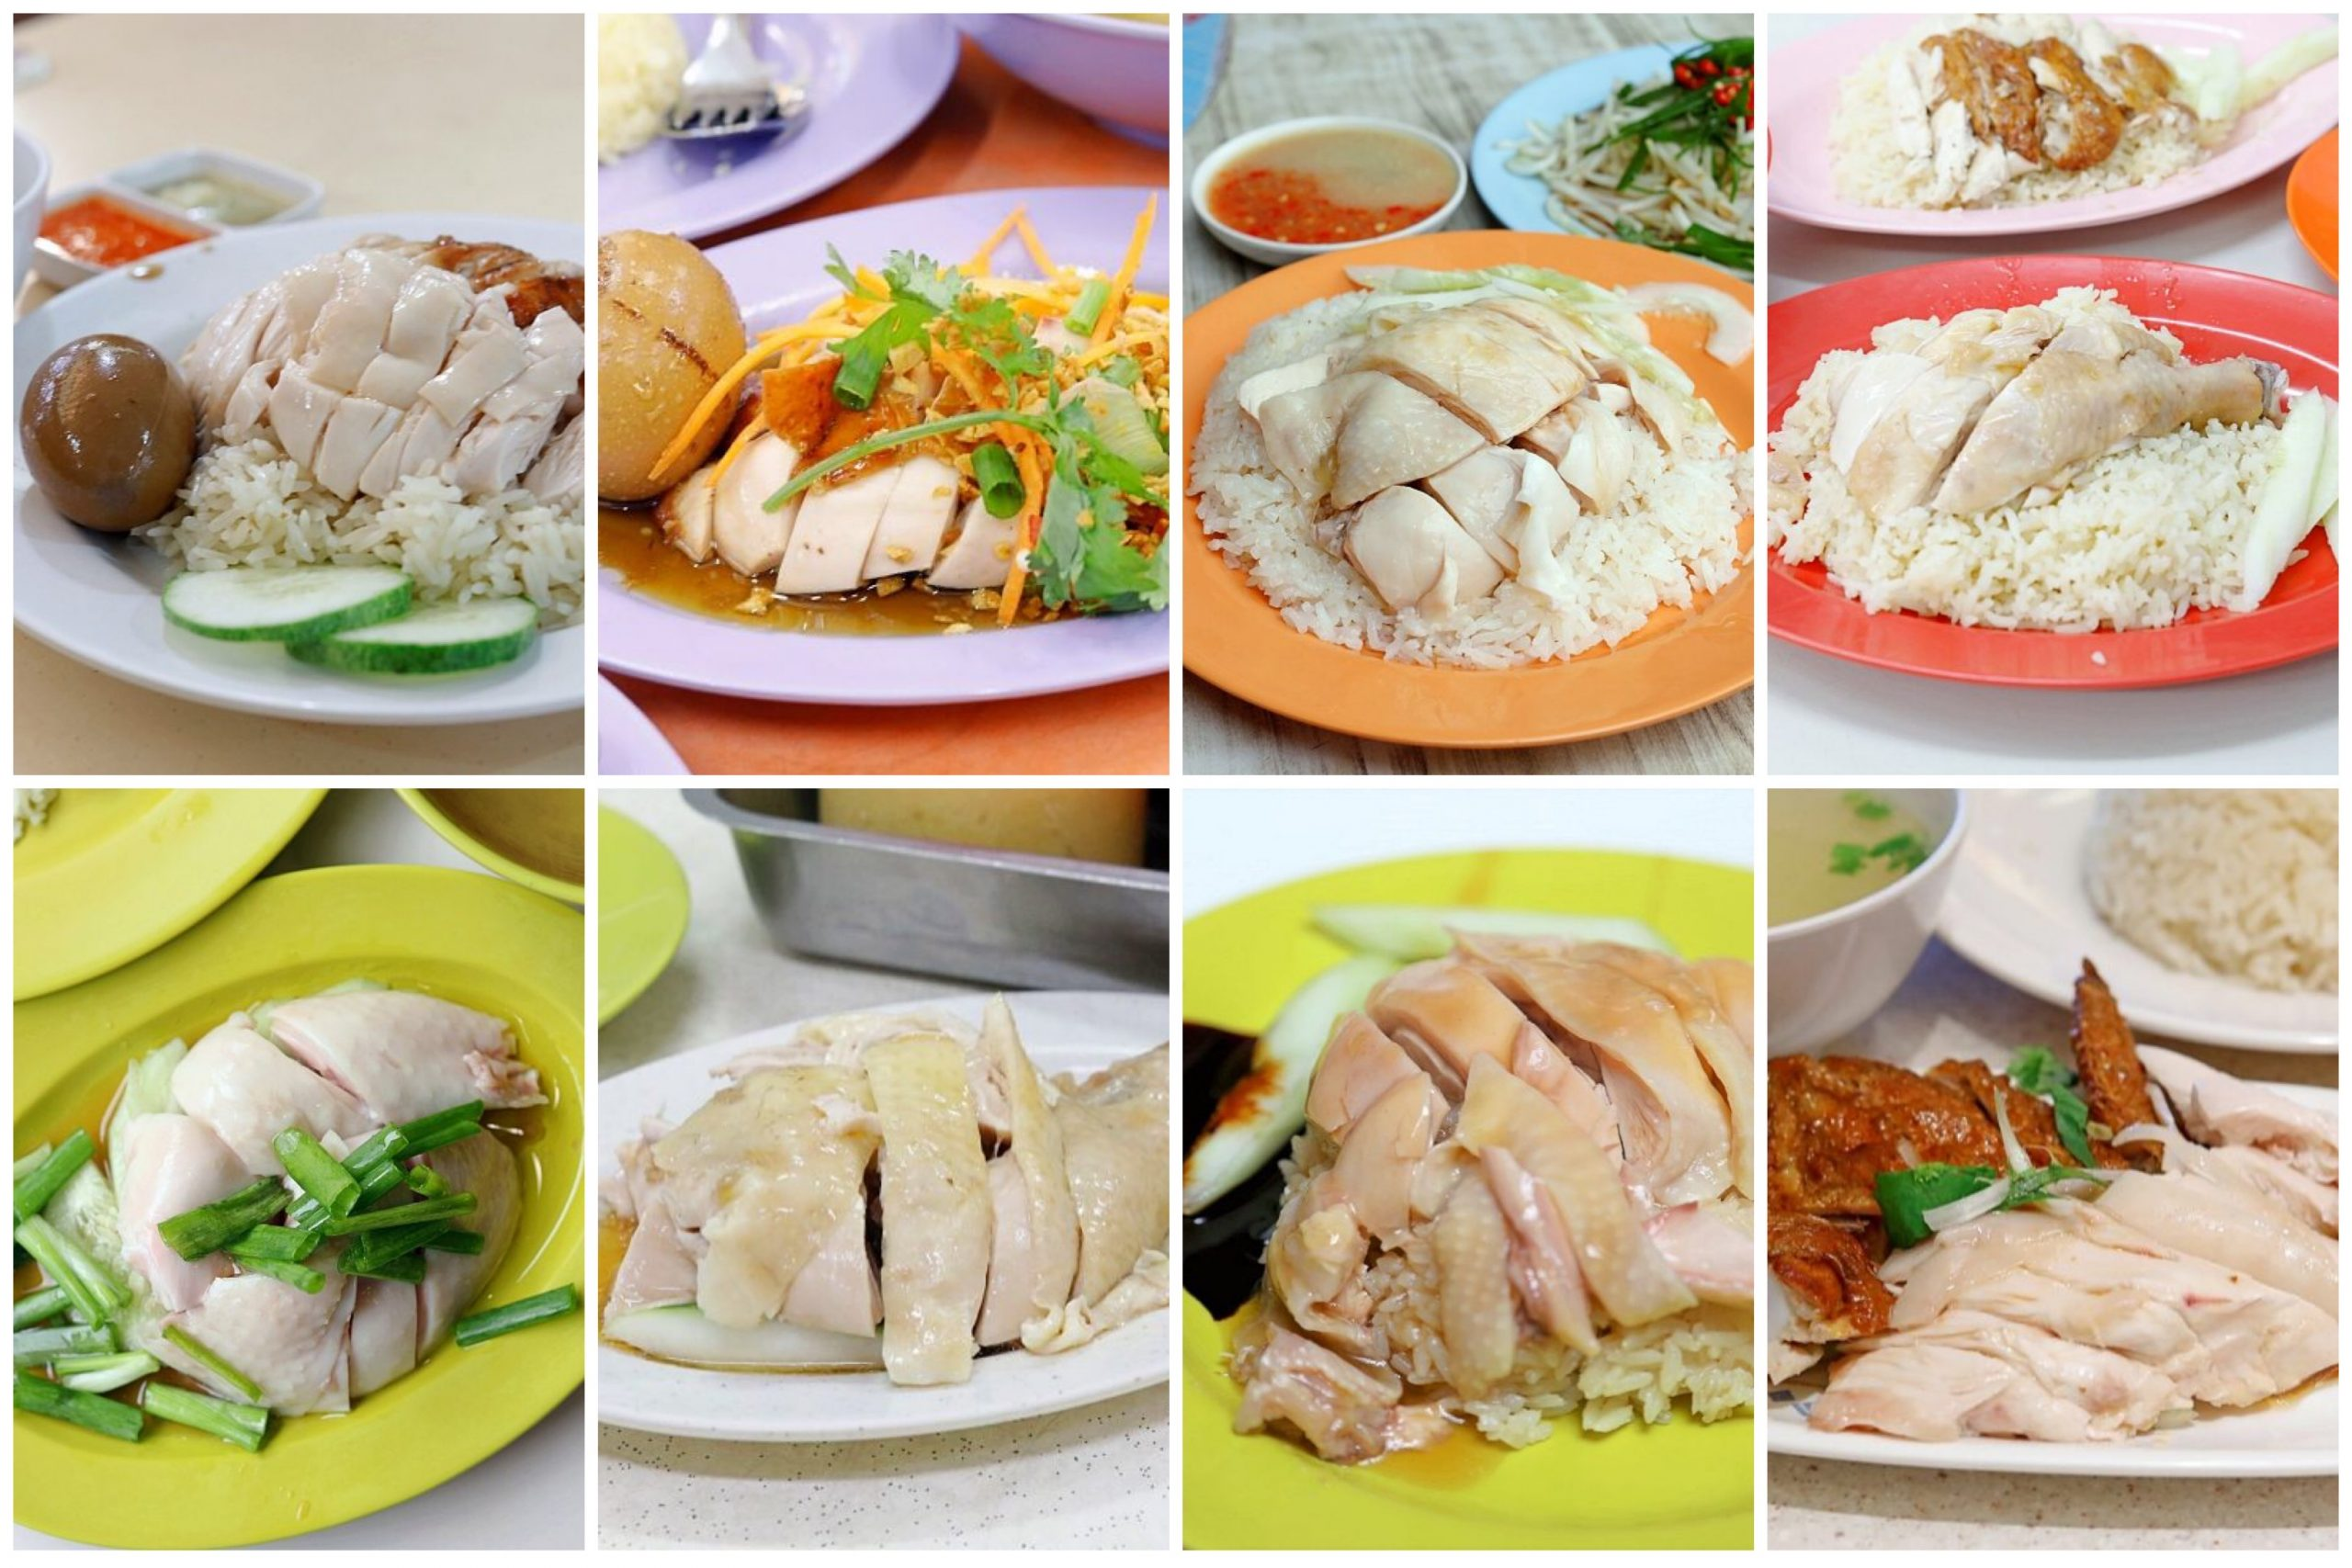 10 Hainanese Chicken Rice In Singapore From Sin Kee Hua Kee Chin Chin To Delicious Boneless Chicken Rice Danielfooddiary Com